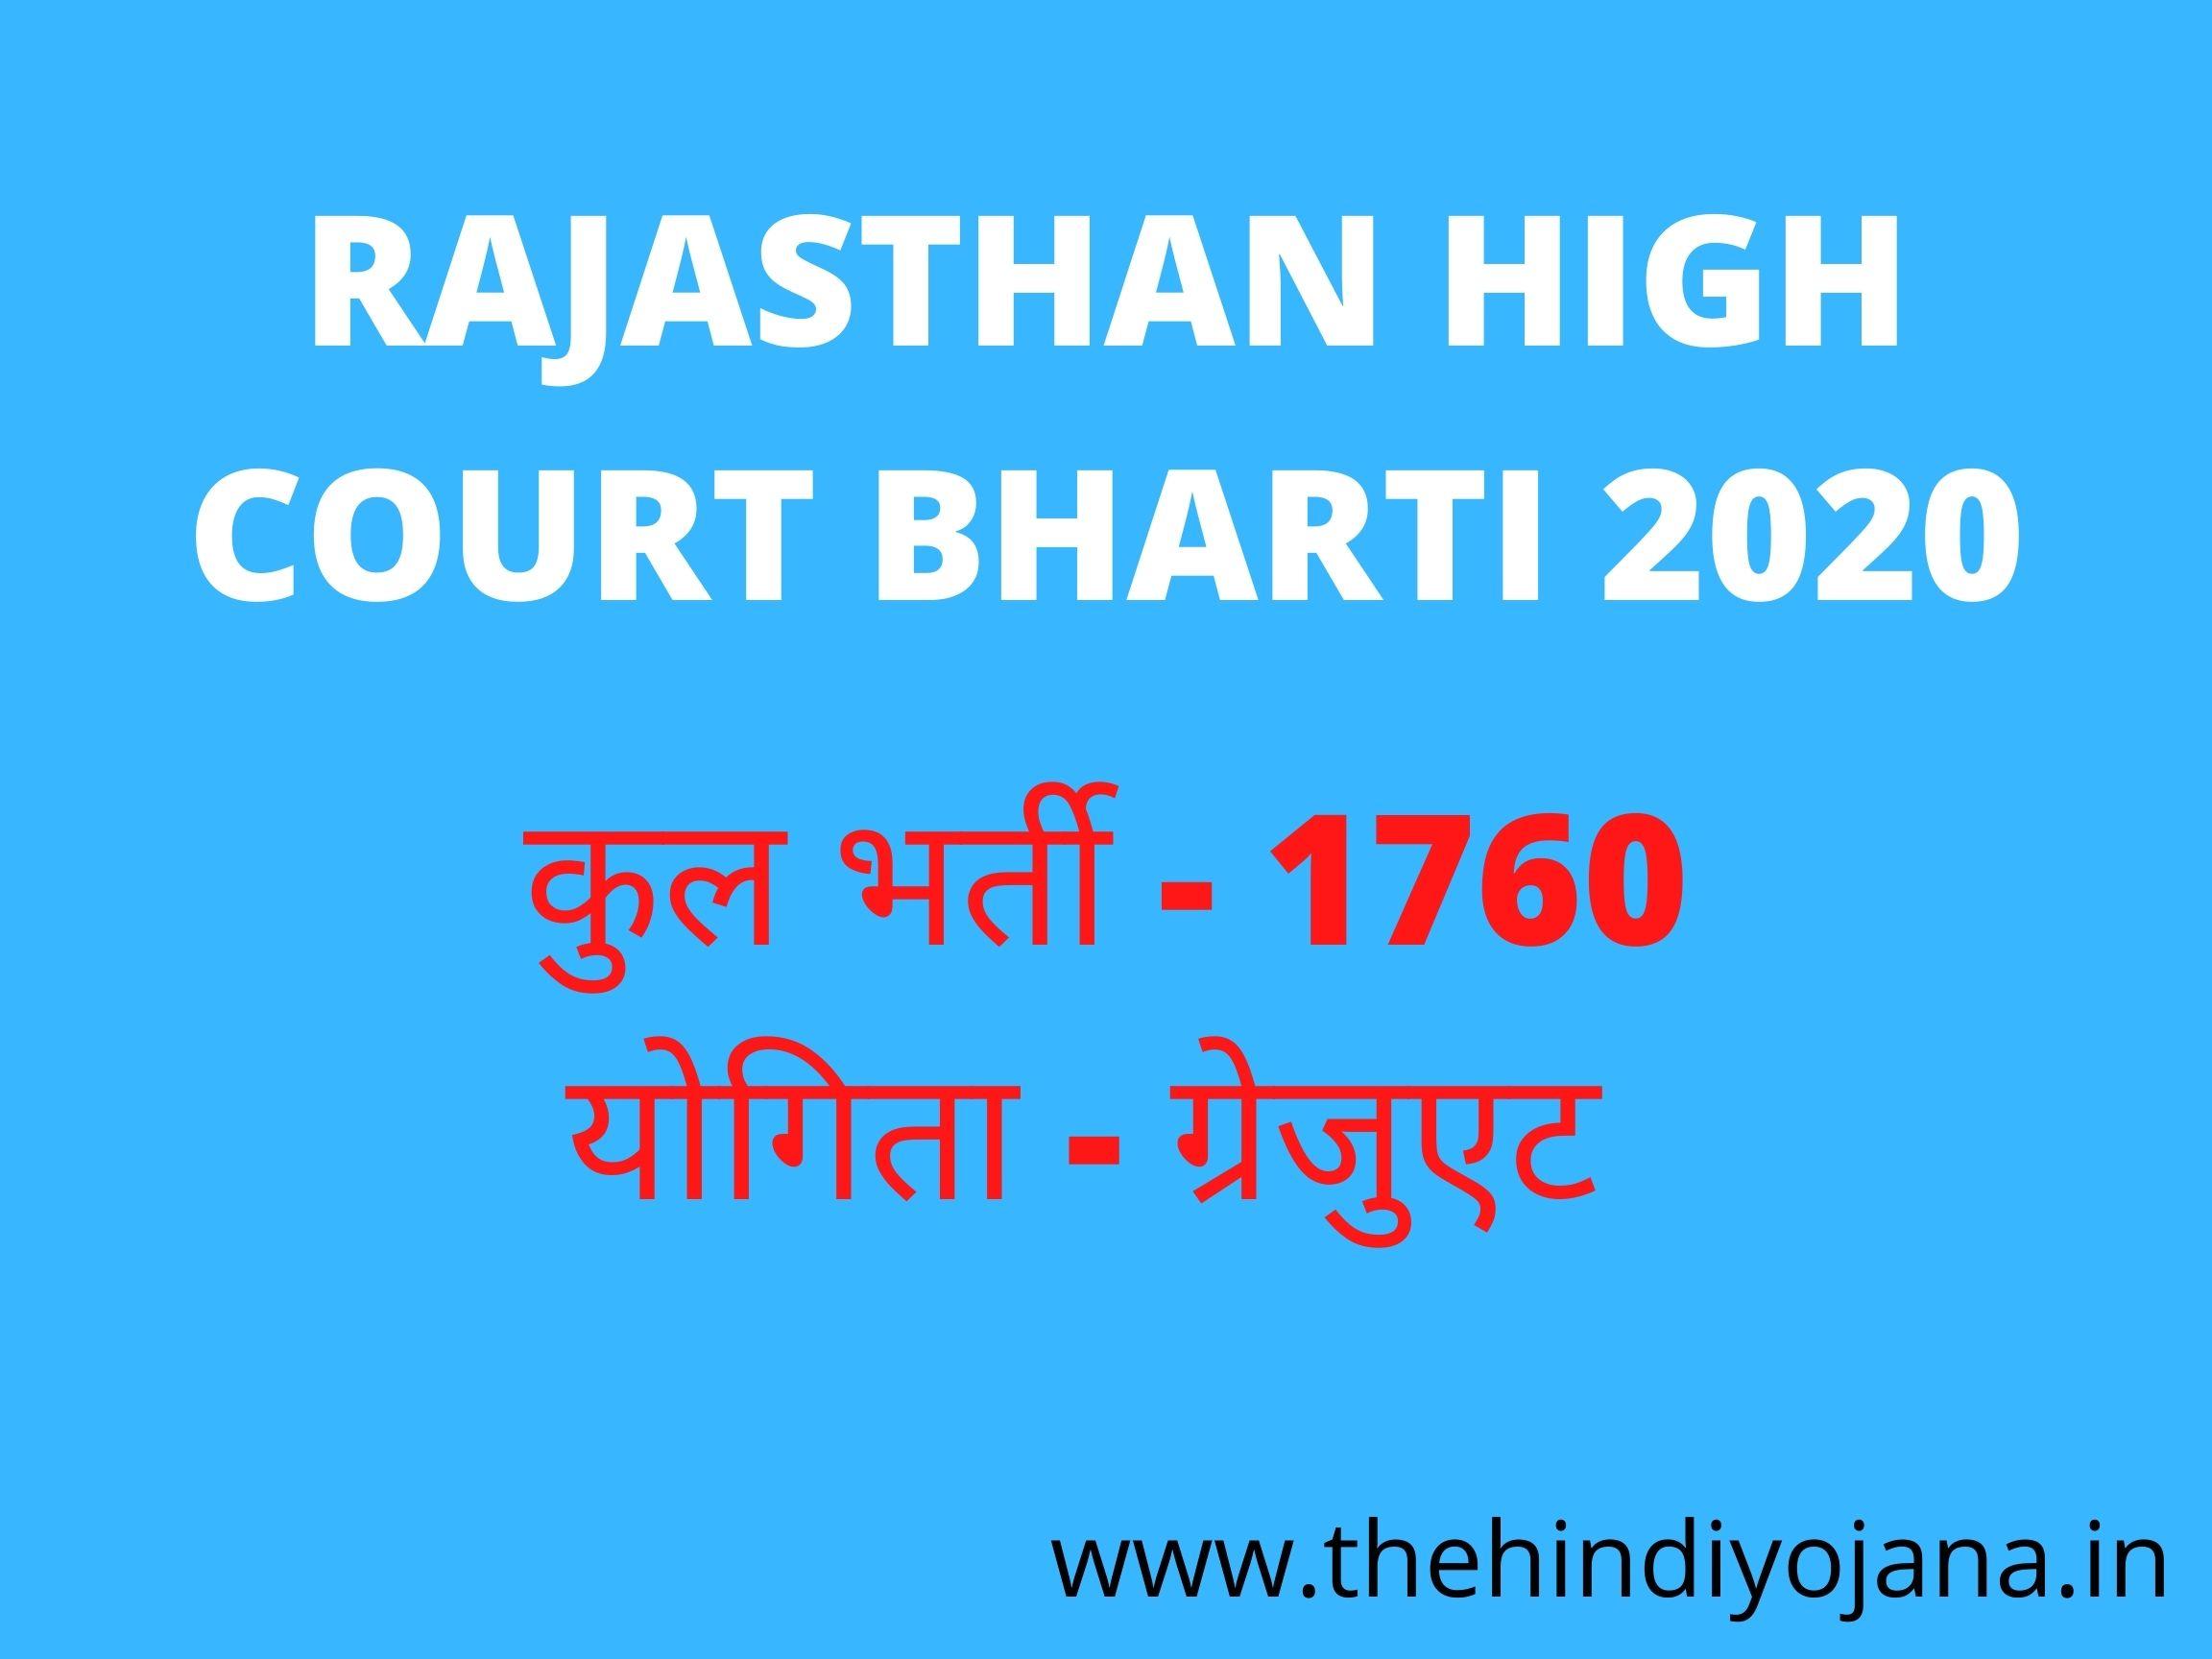 Rajasthan High Court Bharti 2020 राजस्थान हाईकोर्ट भर्ती 2020